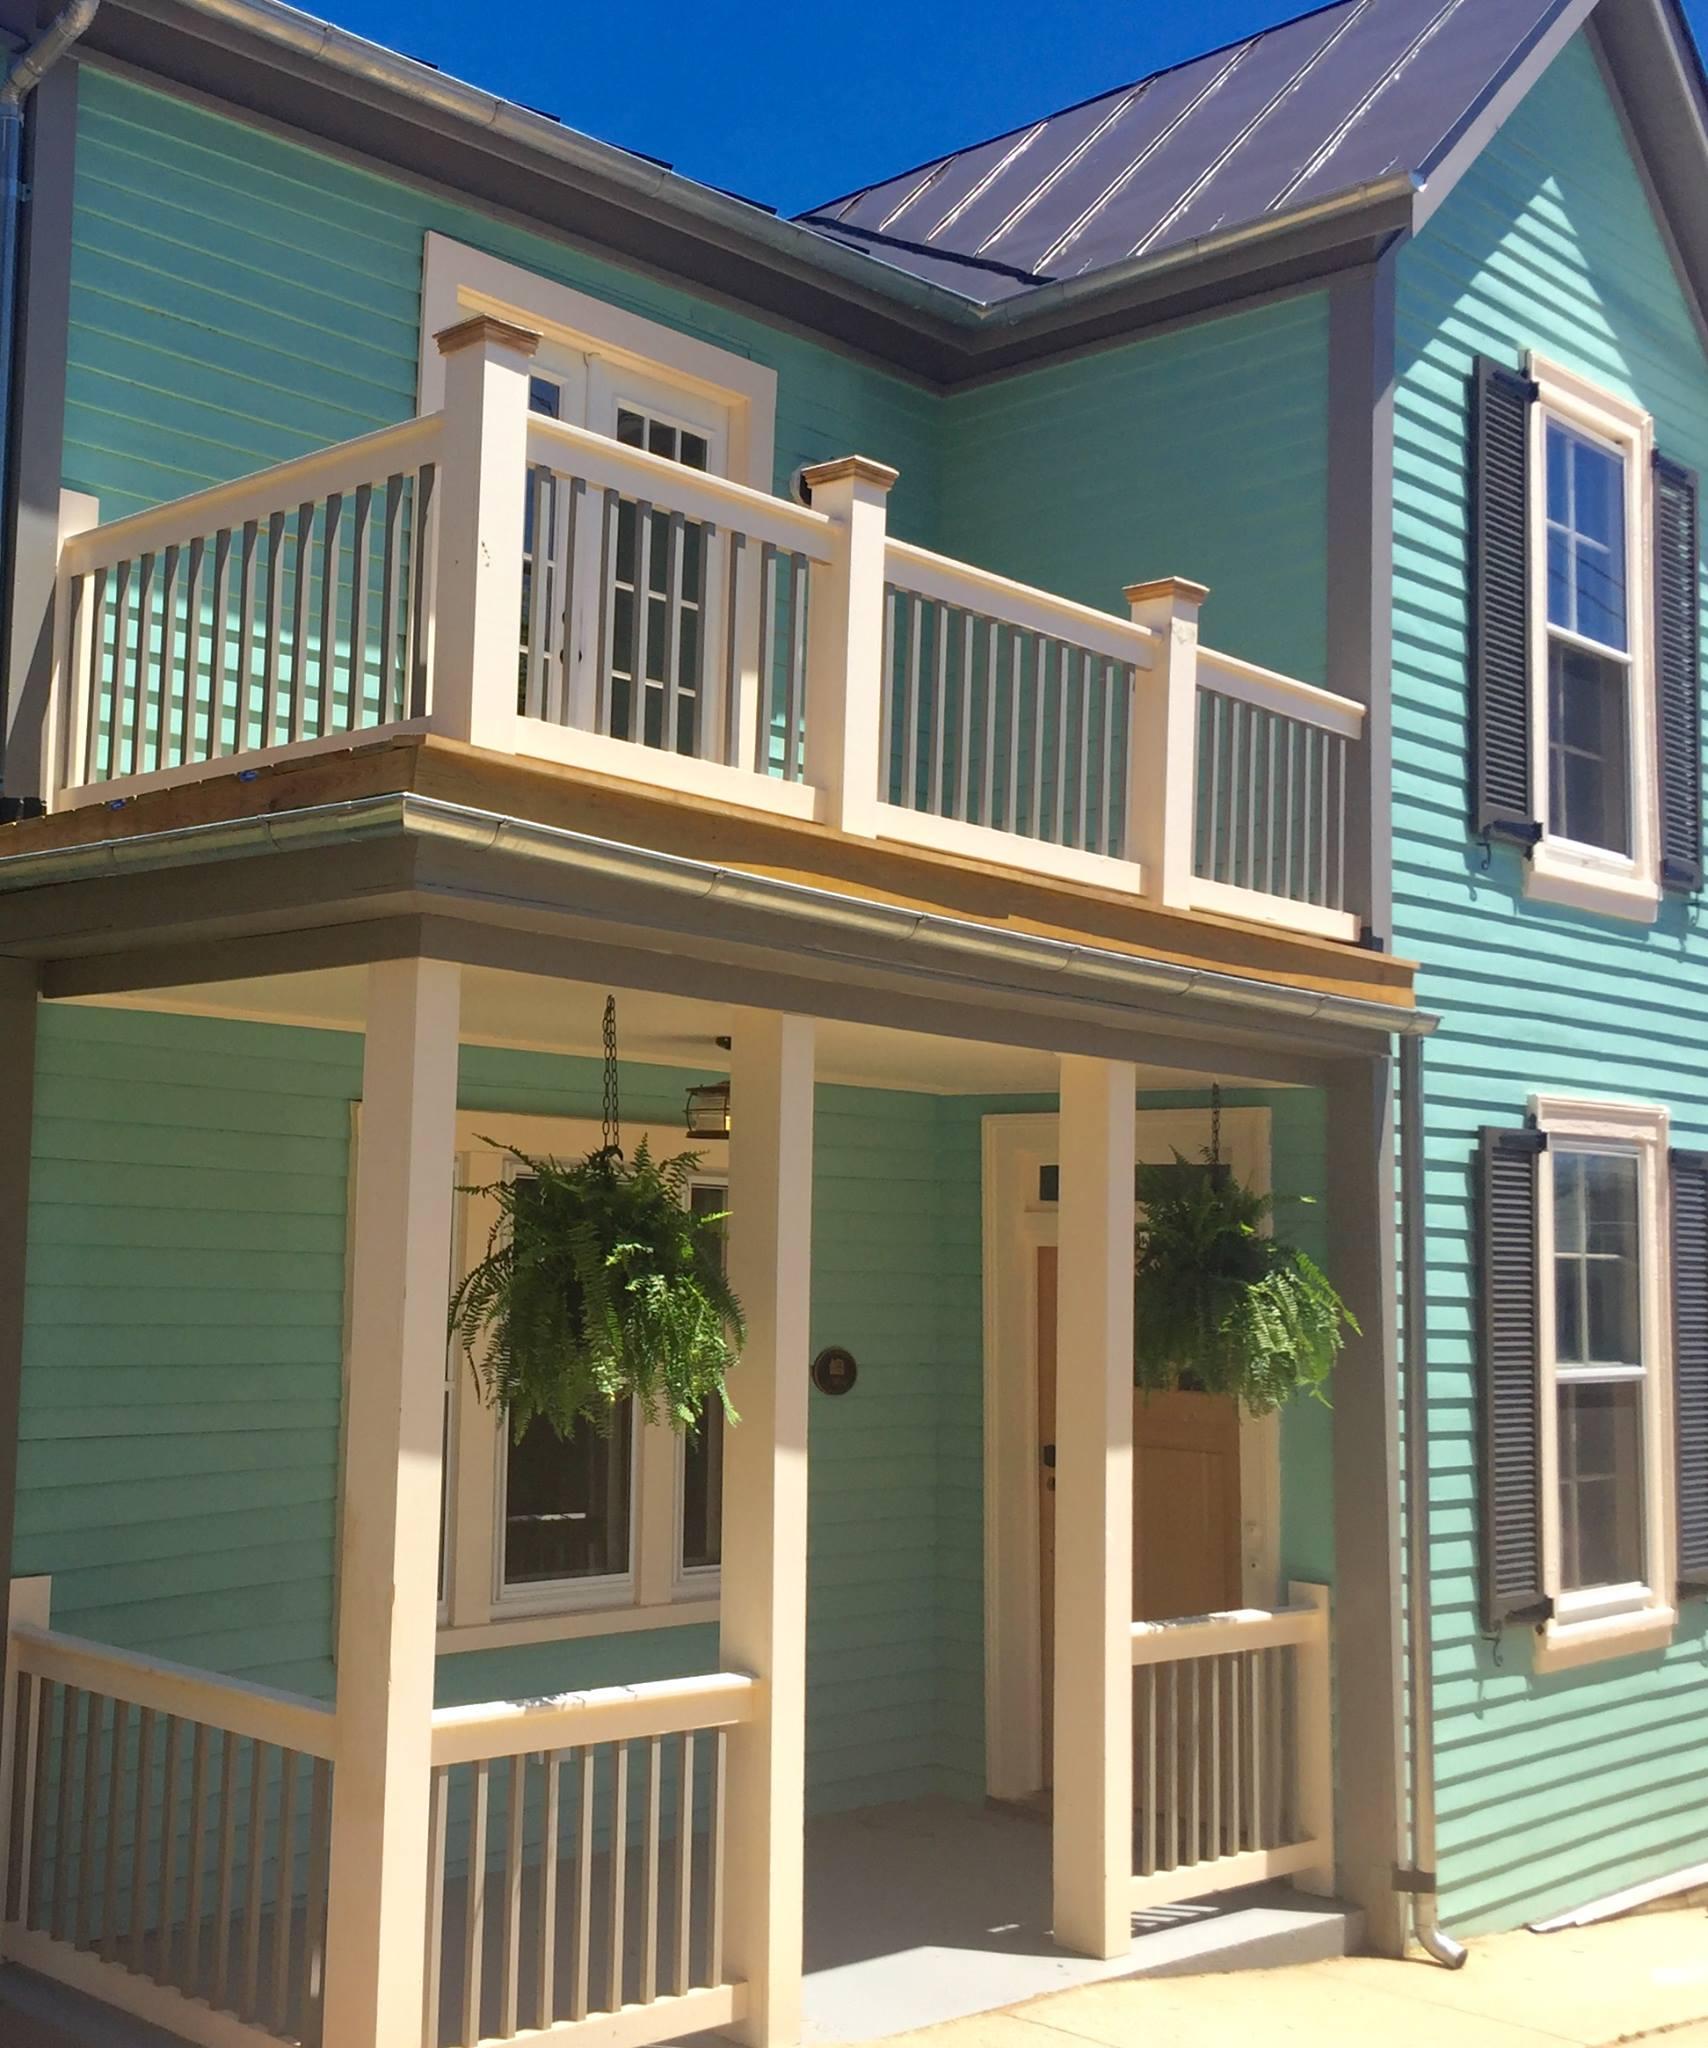 The Landmark restored exterior